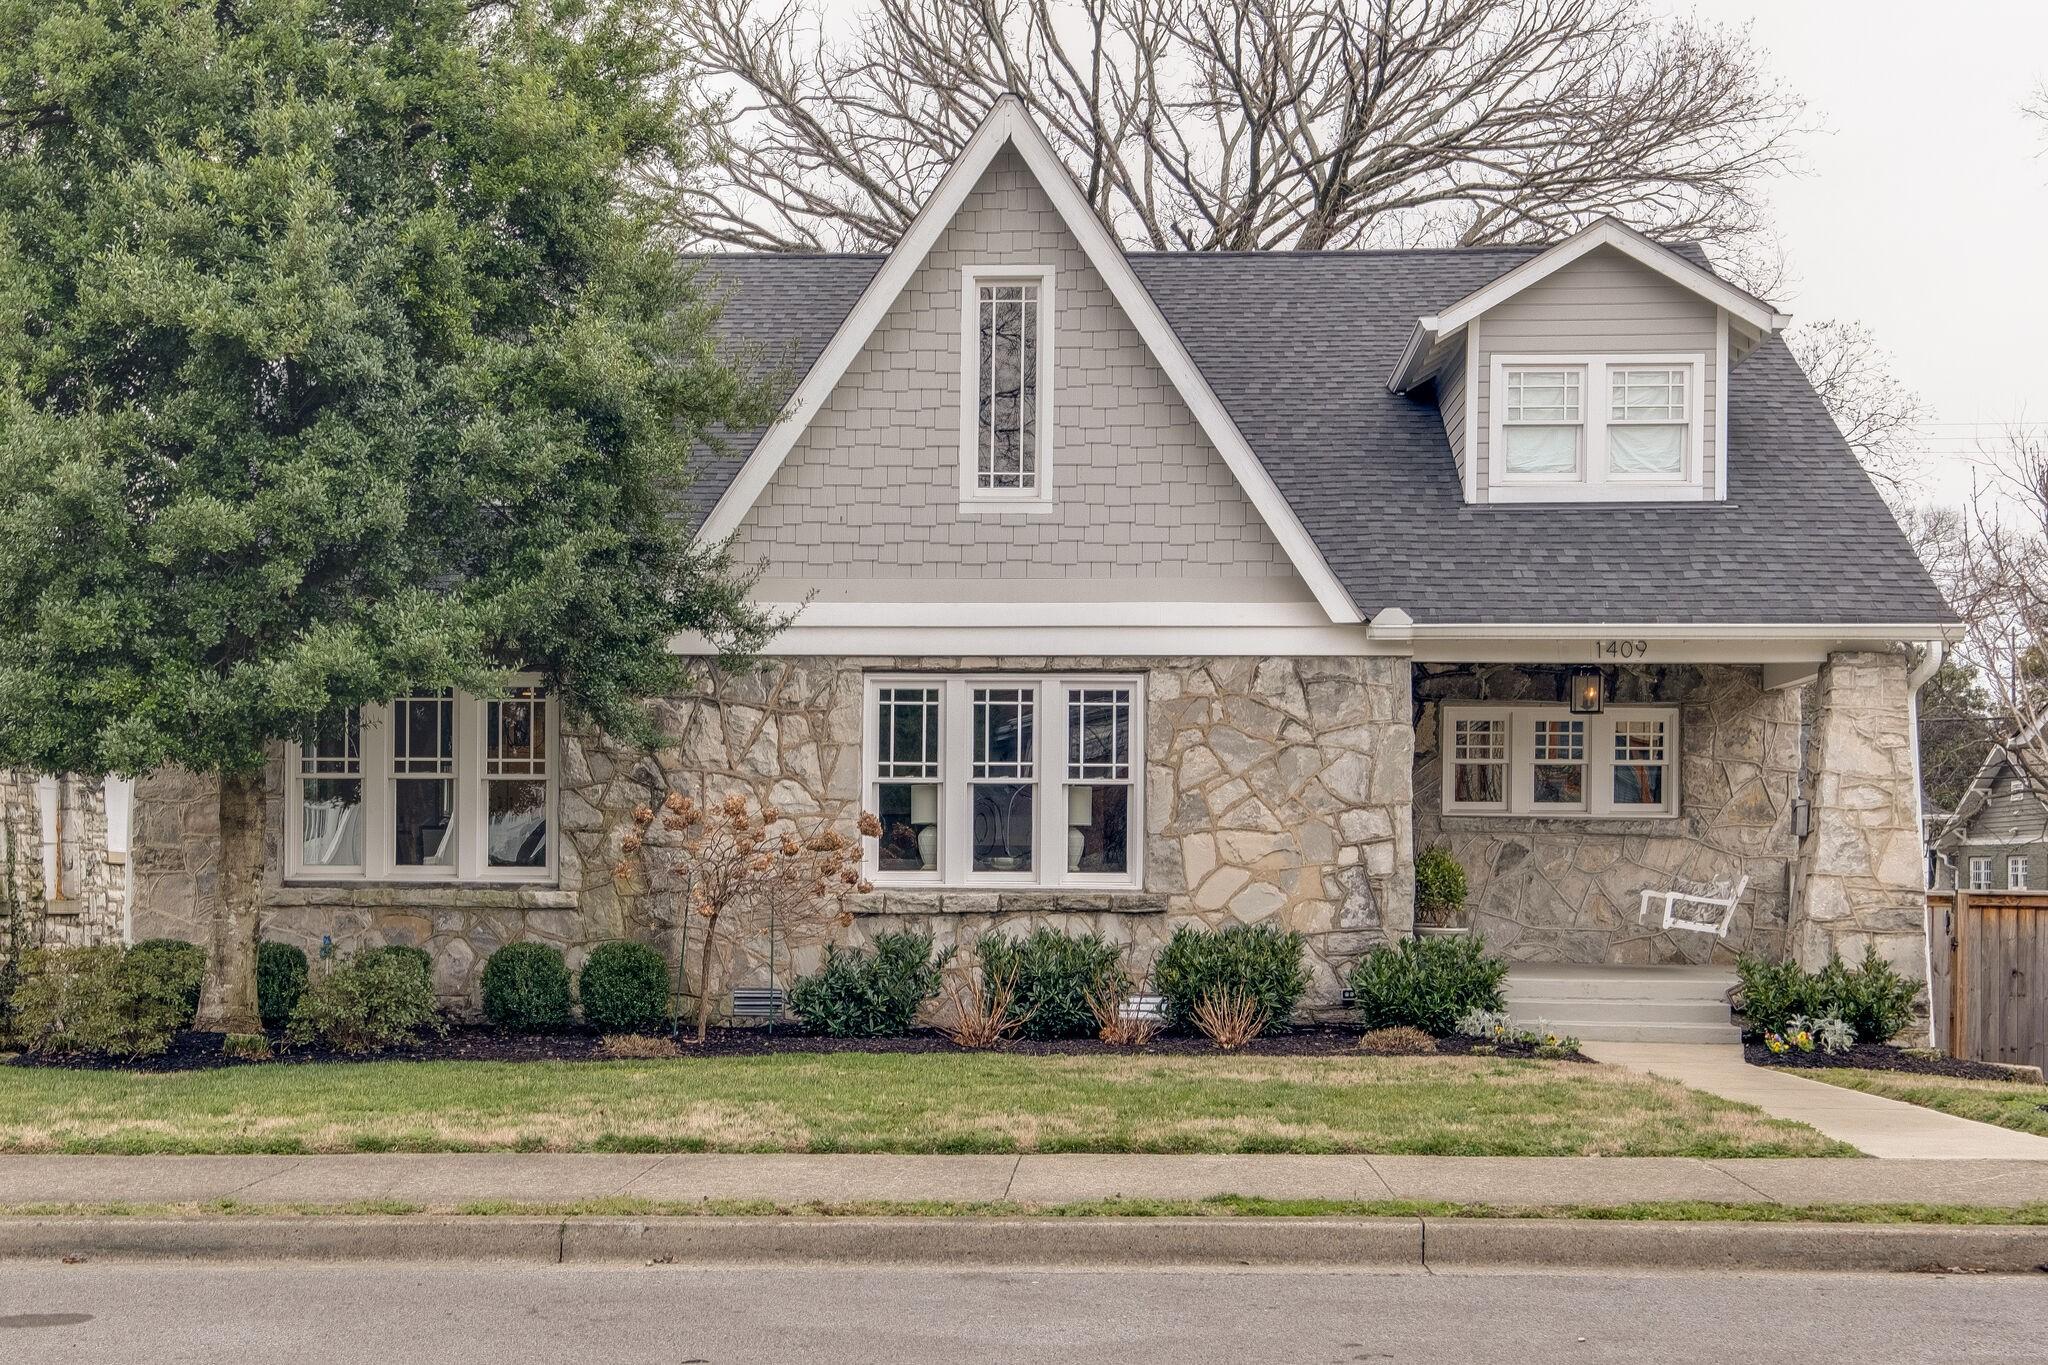 1409 Villa Place Property Photo - Nashville, TN real estate listing